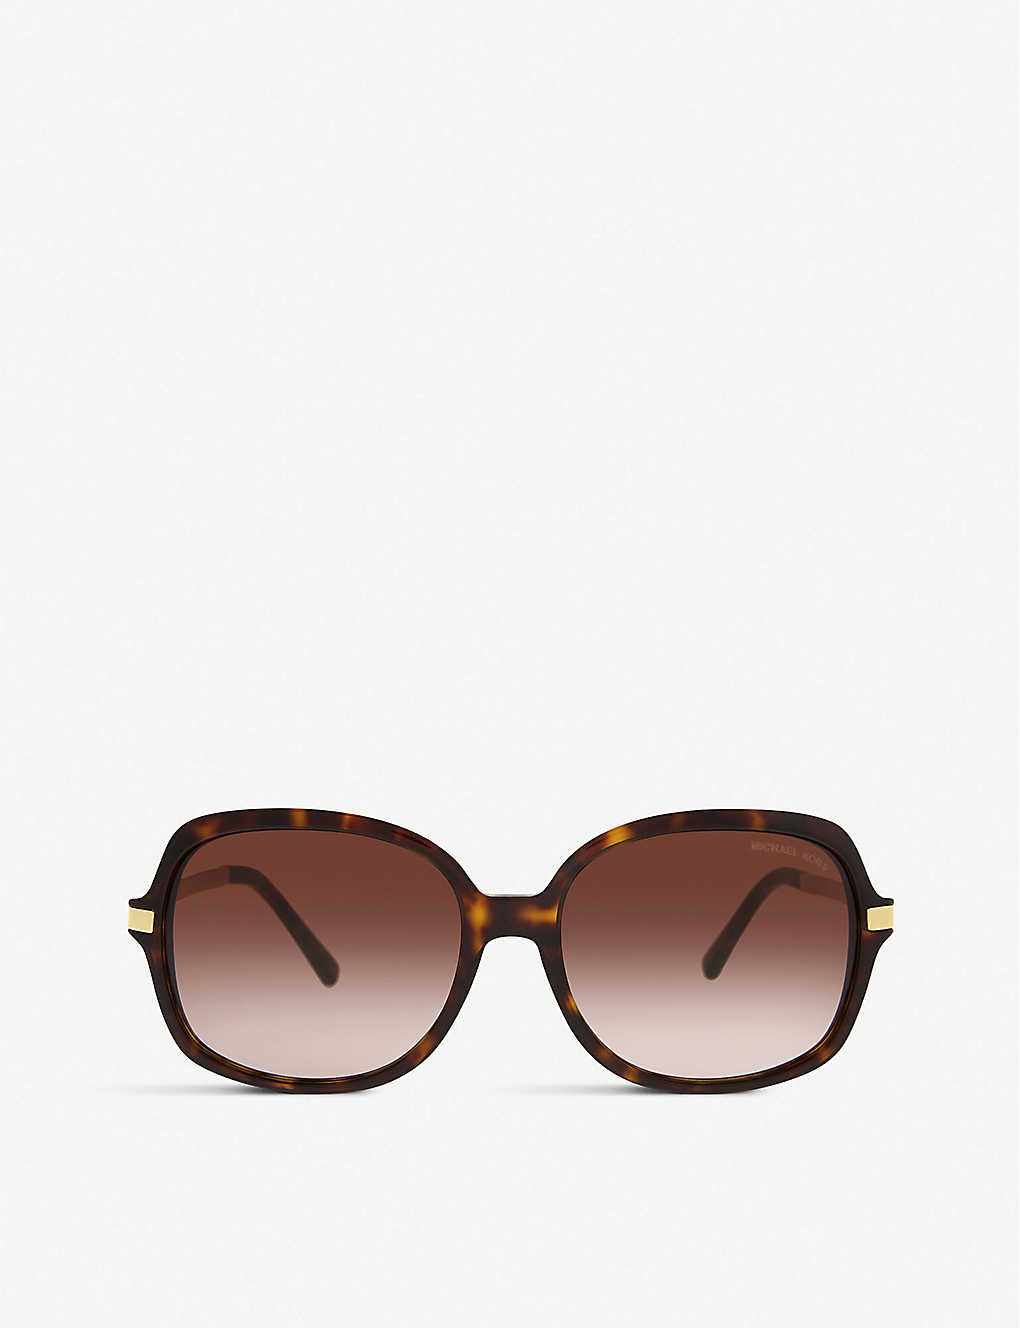 7cfc8e195b8 MICHAEL KORS - MK2024 Adrianna II round-frame sunglasses ...